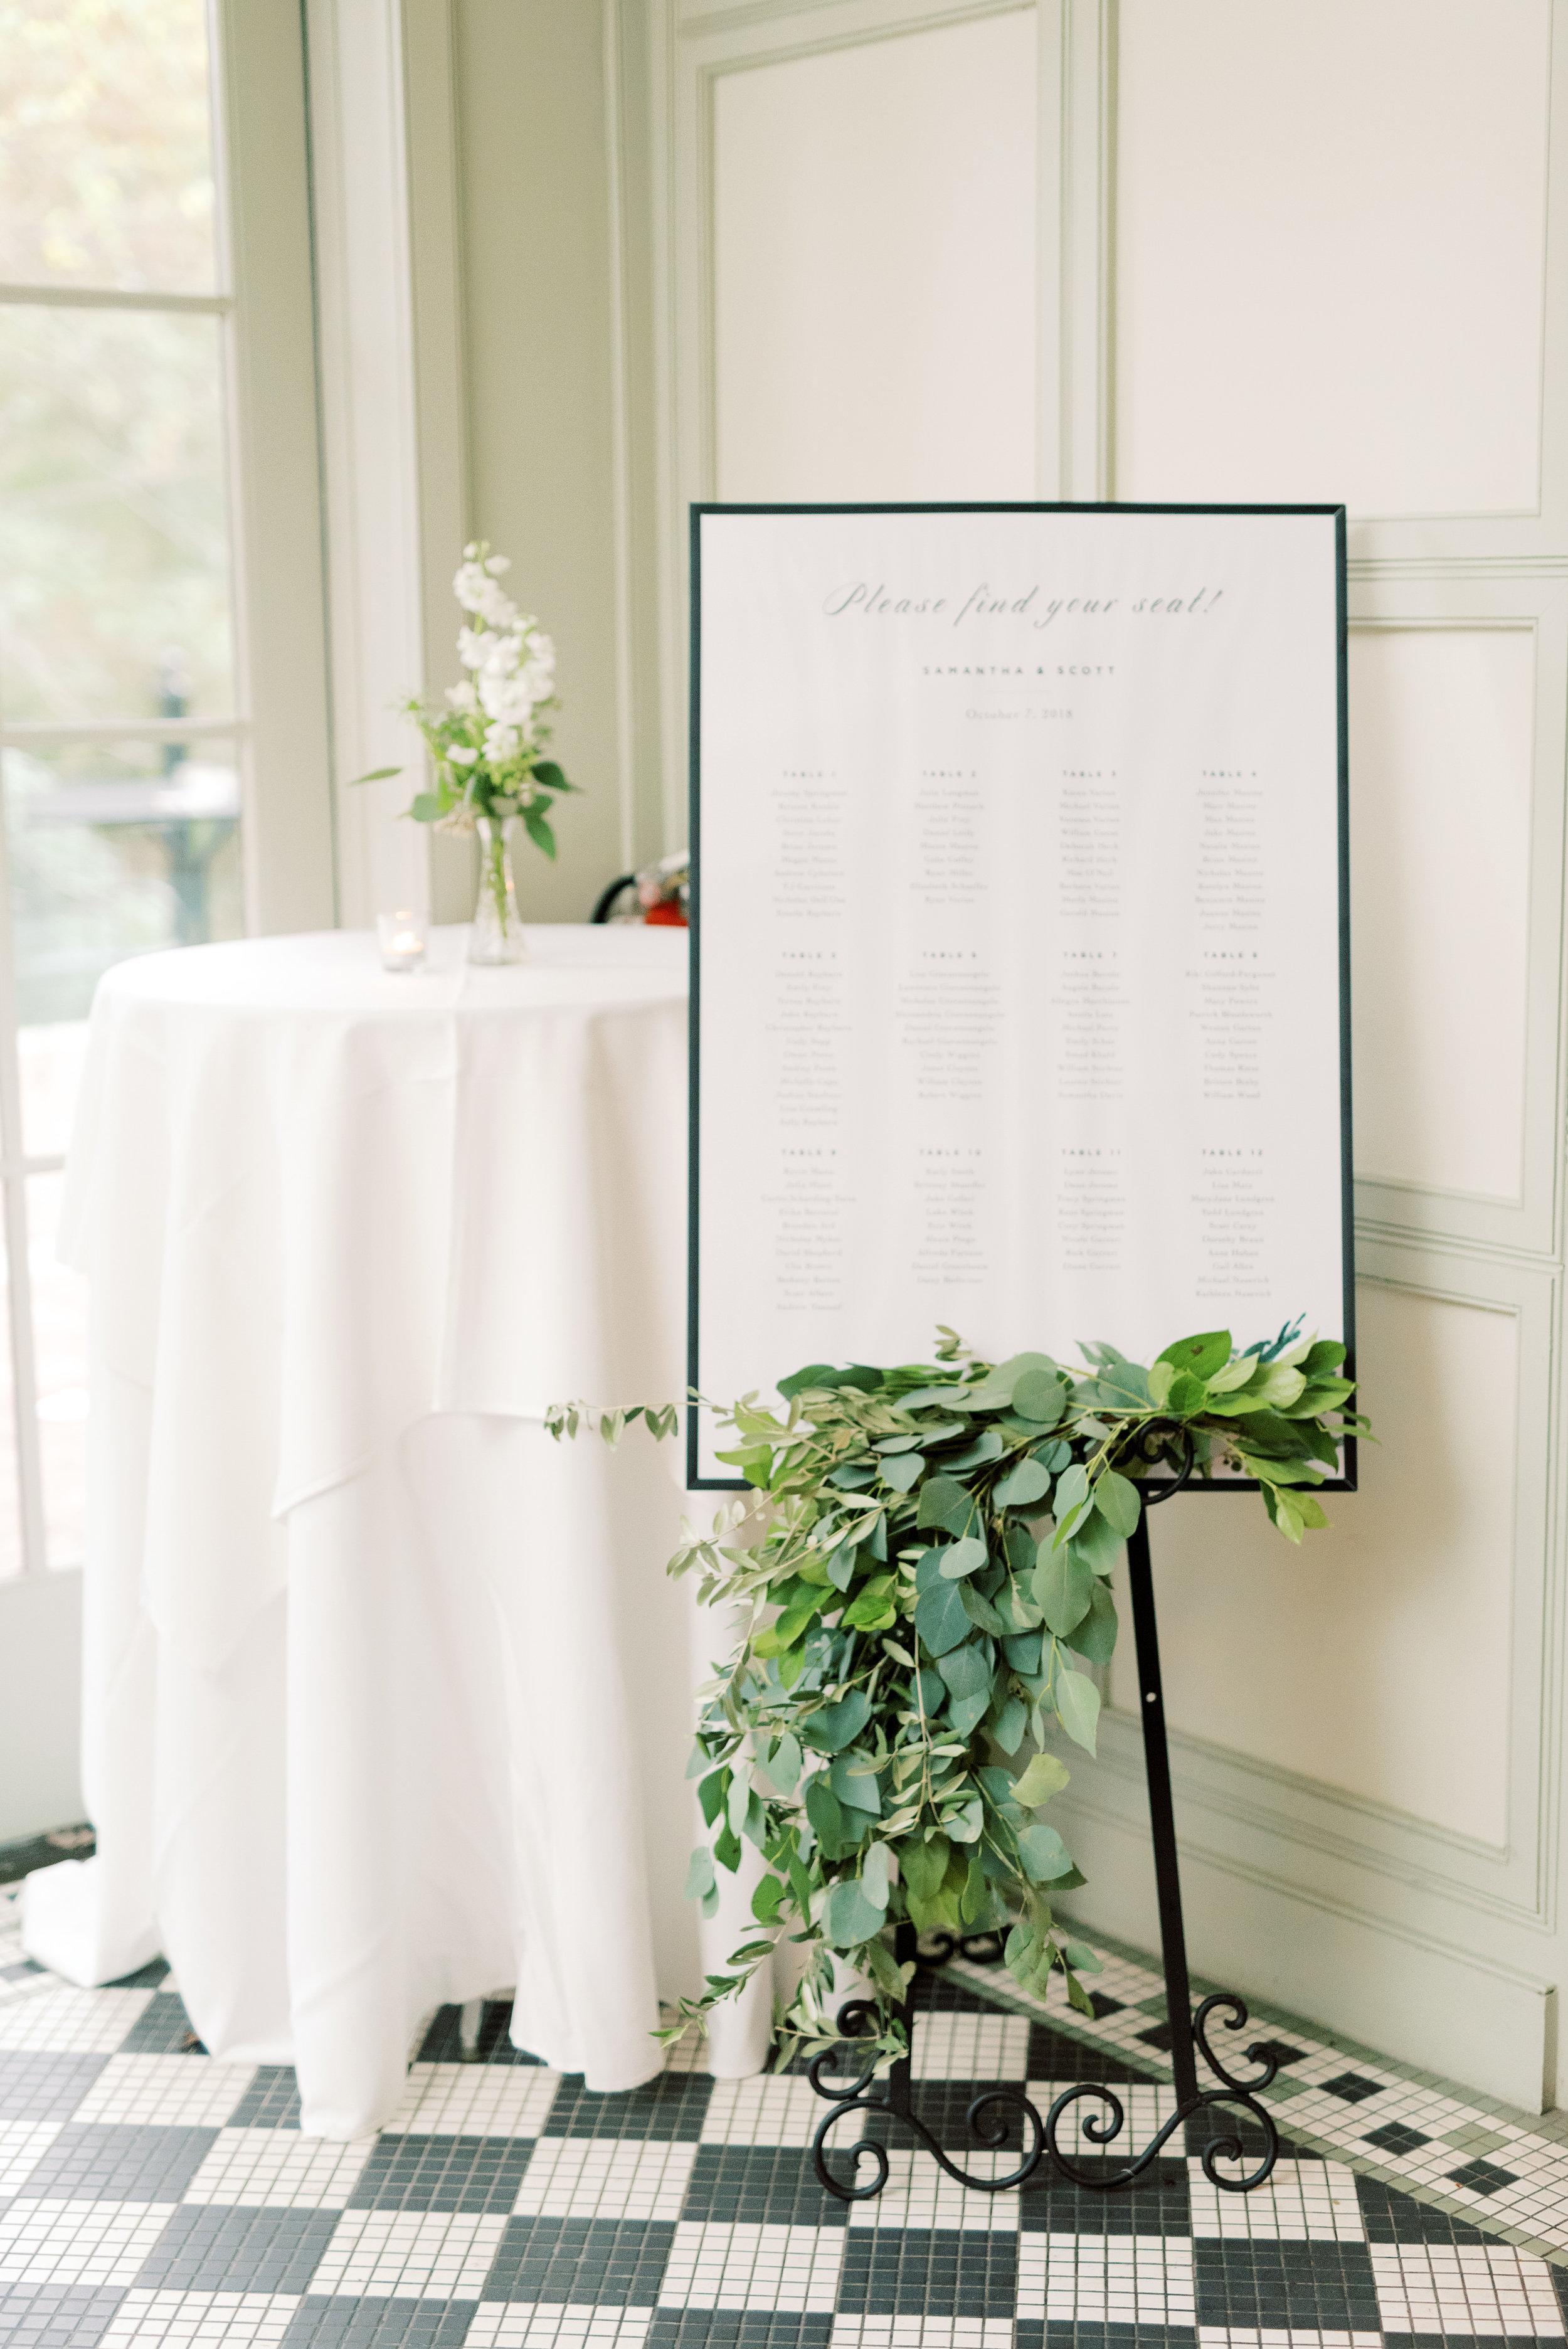 haley-richter-photography-october-hotel-du-village-wedding-046.jpg